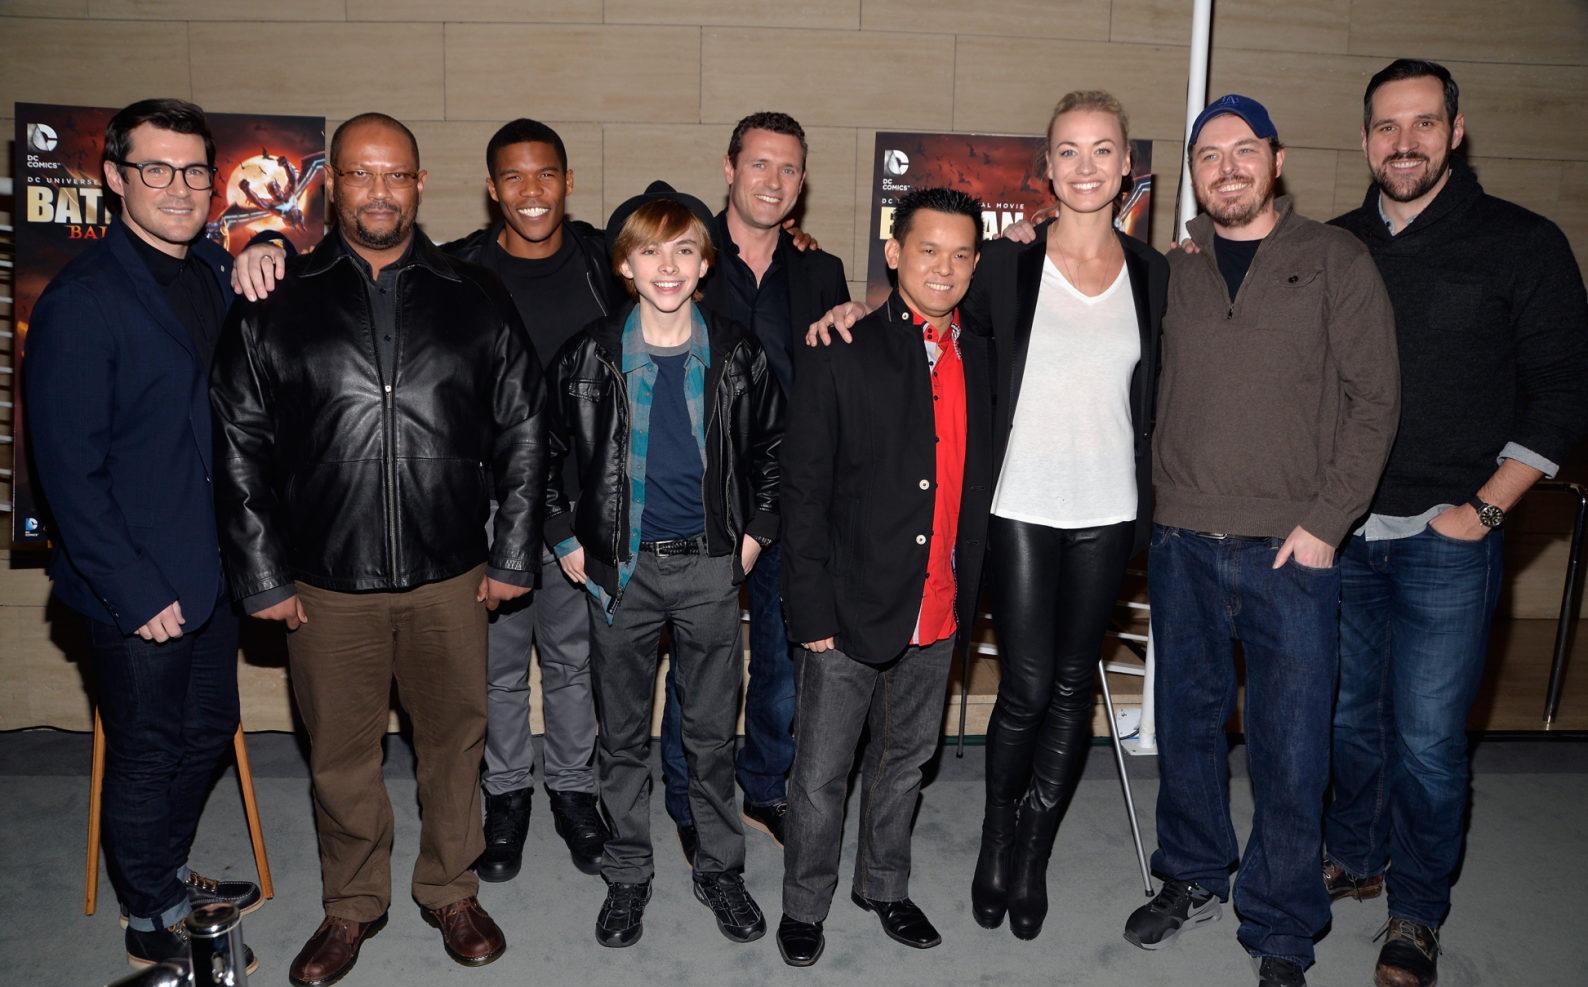 Yvonne Strahovski attends Batman Bad Blood premiere